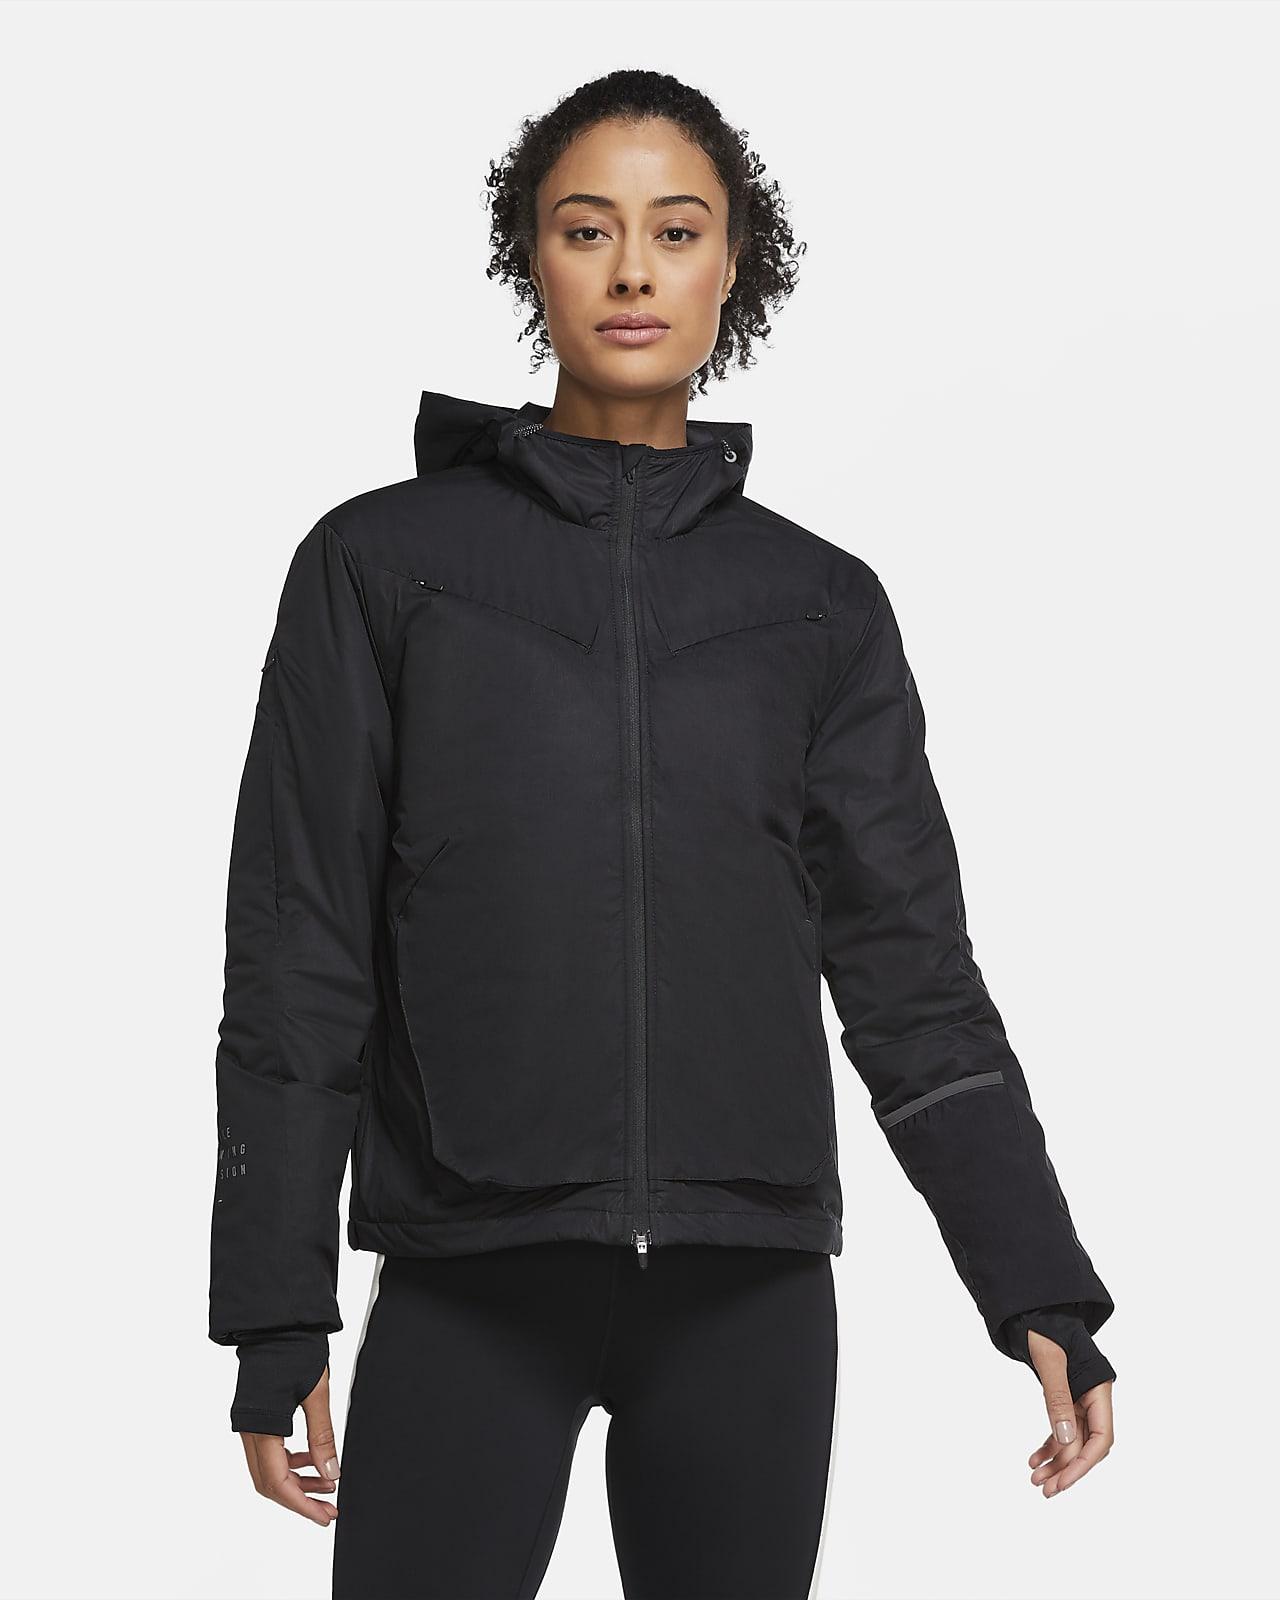 Nike Run Division Women's Dynamic Vent Running Jacket